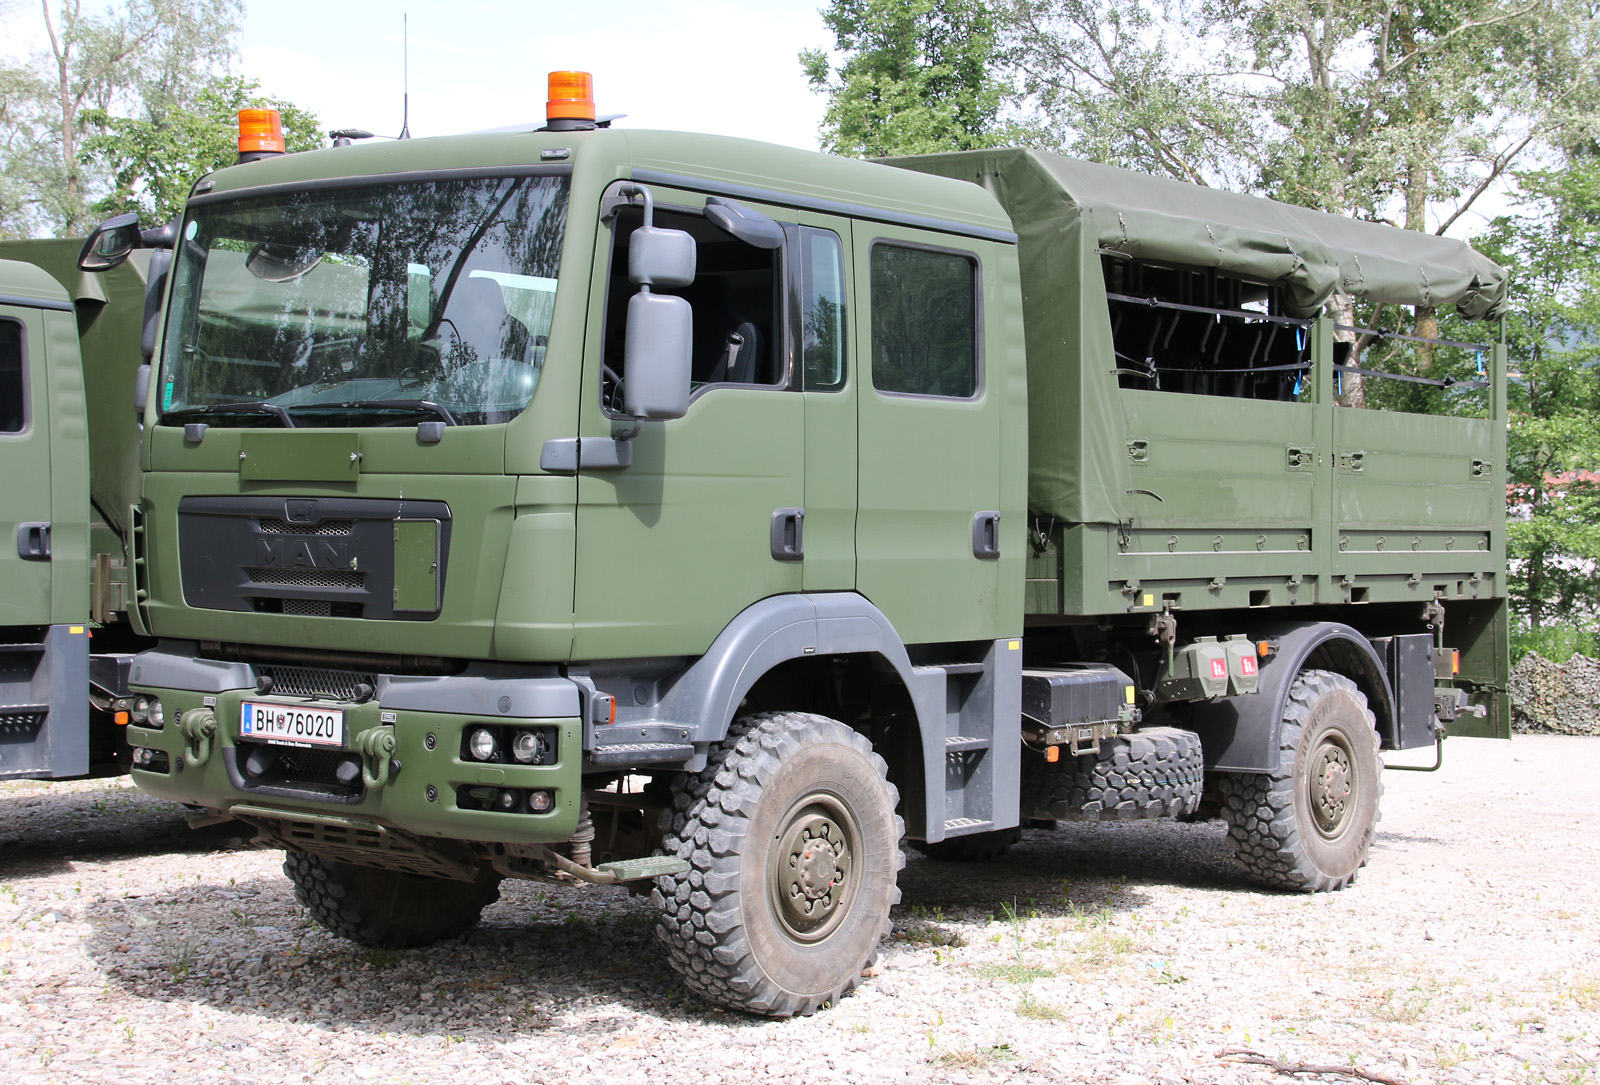 MAN TGM 14.280 4x4 AD/DOKA/FS - Doppelkabine in Fahrschulausführung (FS) © Doppeladler.com